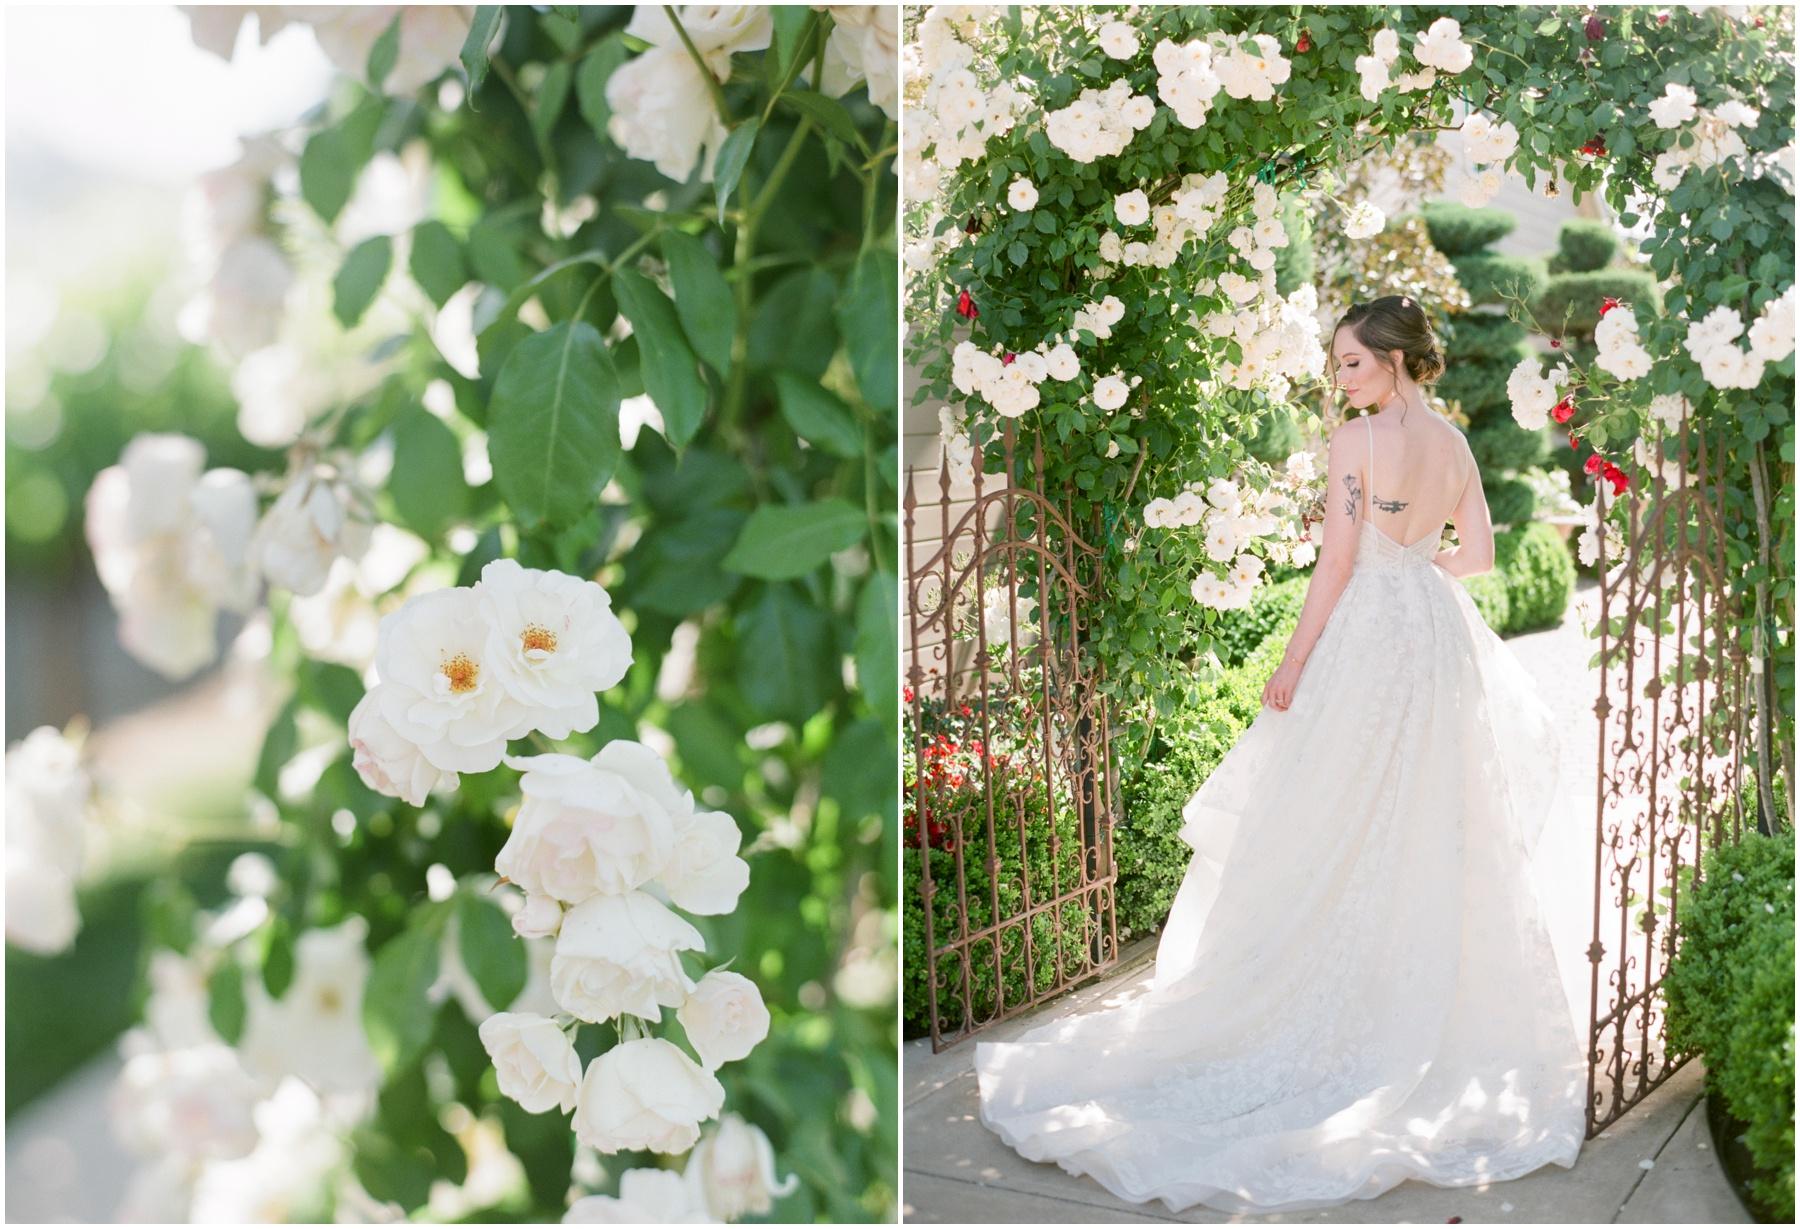 Scribner-bend-vineyards-wedding-sacramento-california-Kristine-Herman-Photography-225.jpg